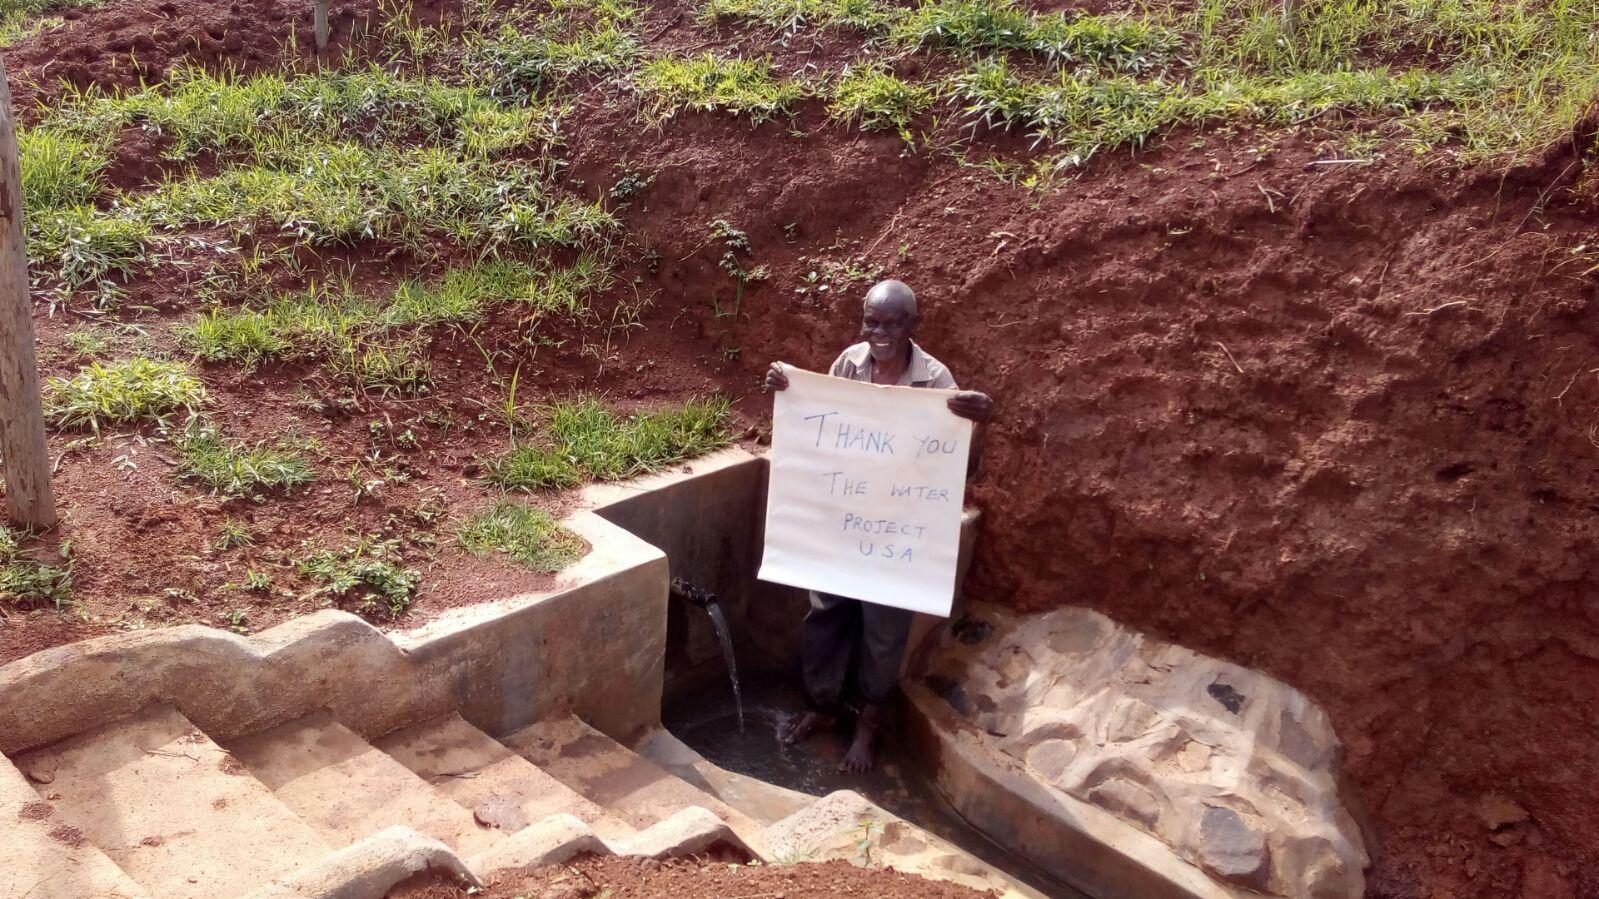 Robert Abu Spring Protection and Sanitation Project